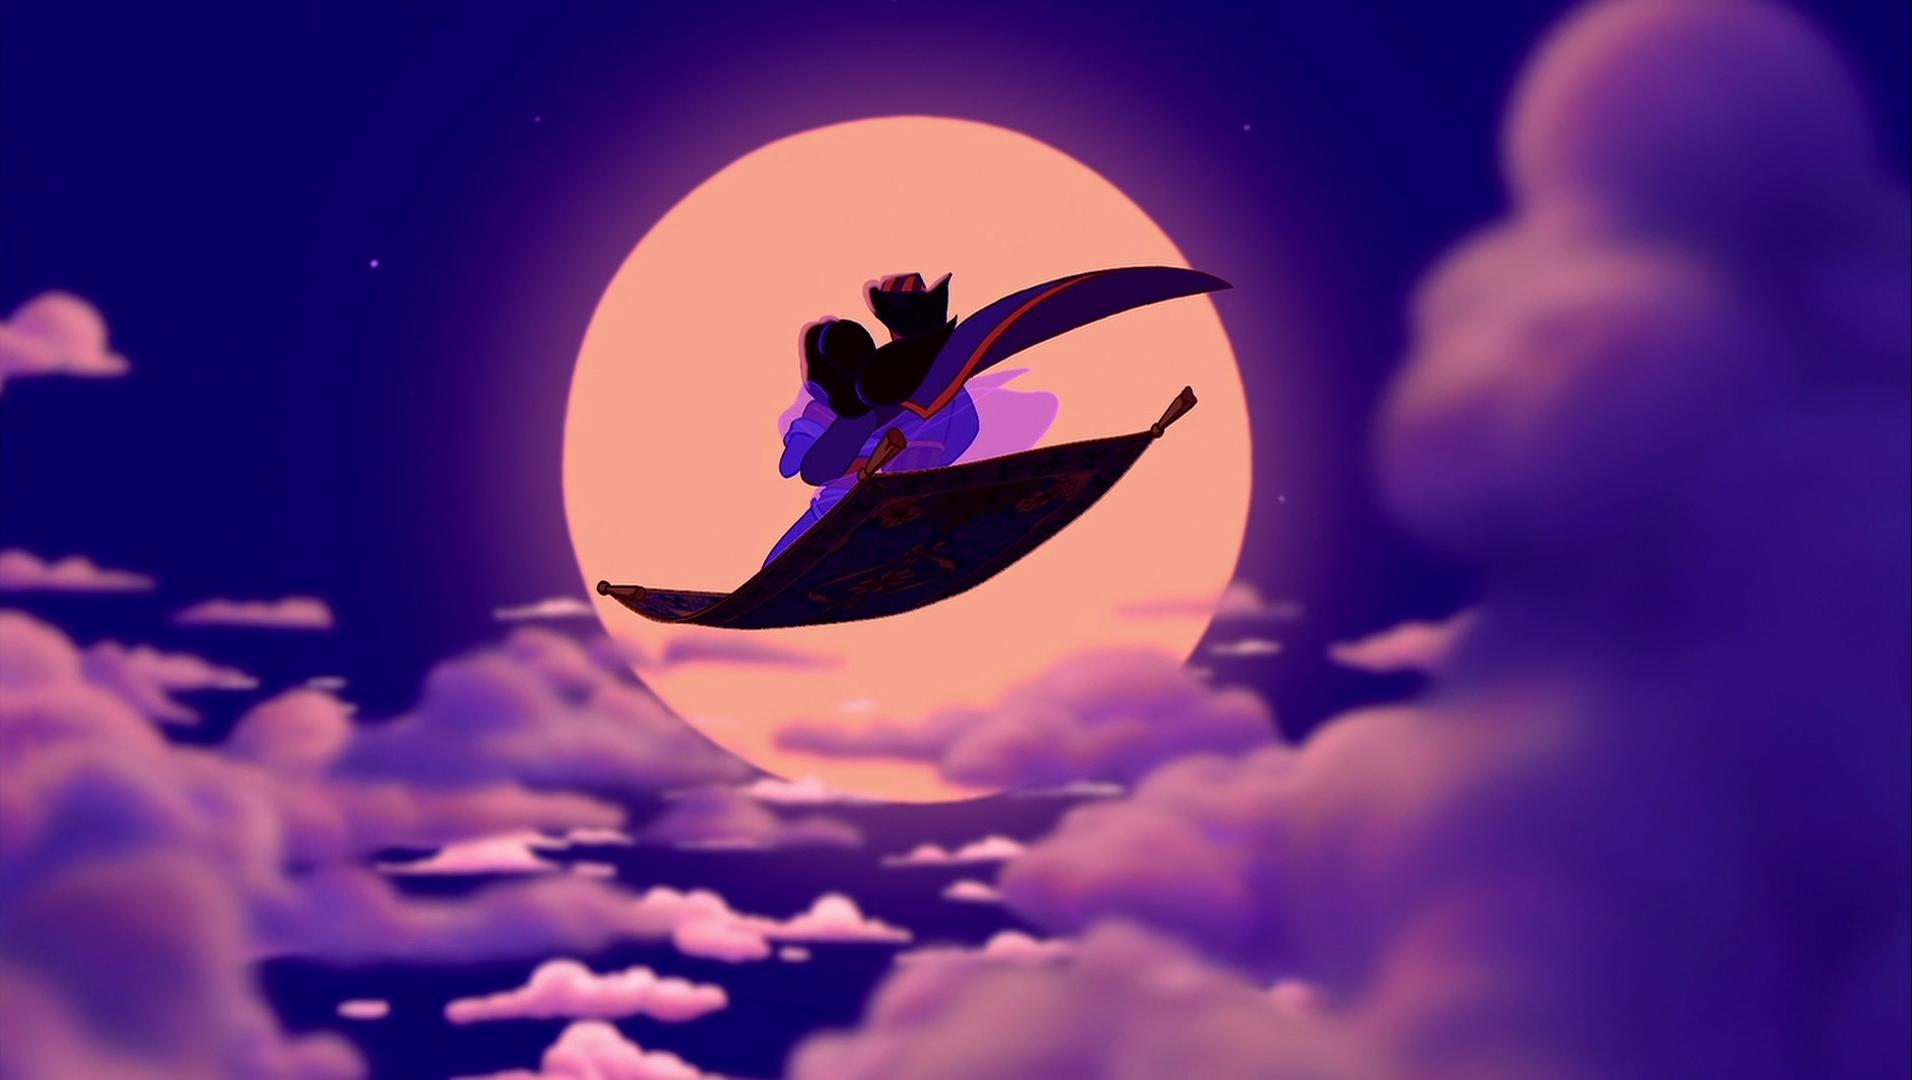 Aladdin_(Bluray_720p).MKV 022 do you really know all the lyrics to a whole new world? playbuzz